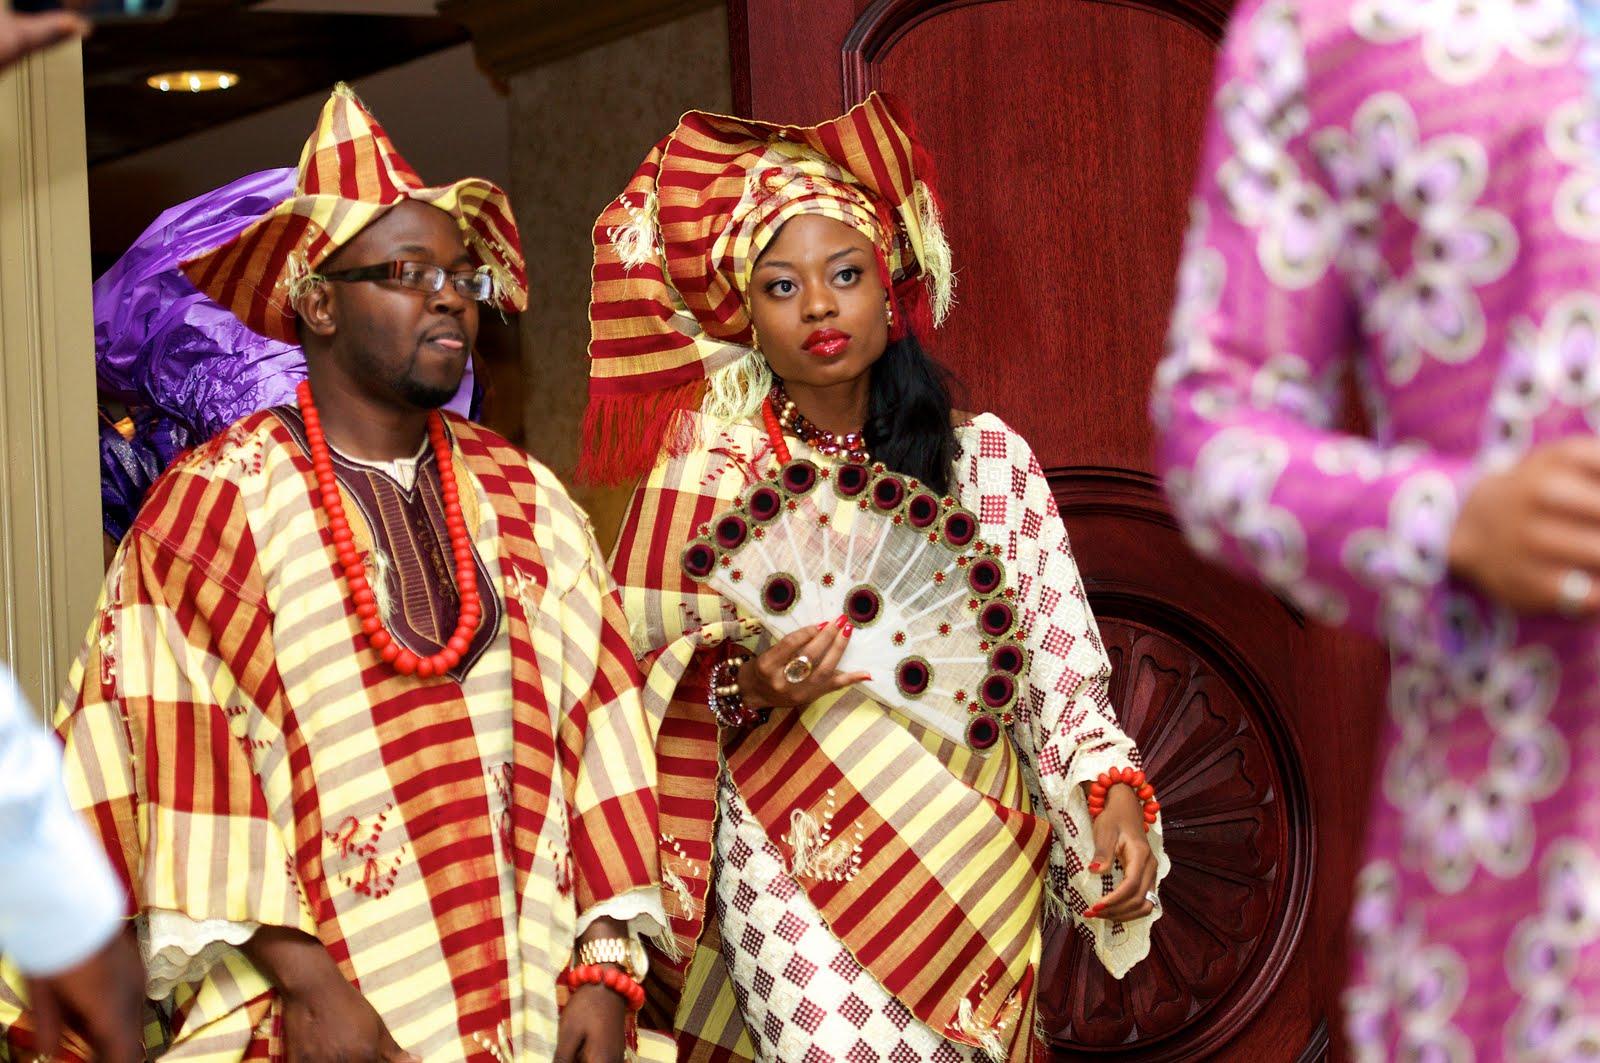 Beautylicious Celebrating the Modern African Woman